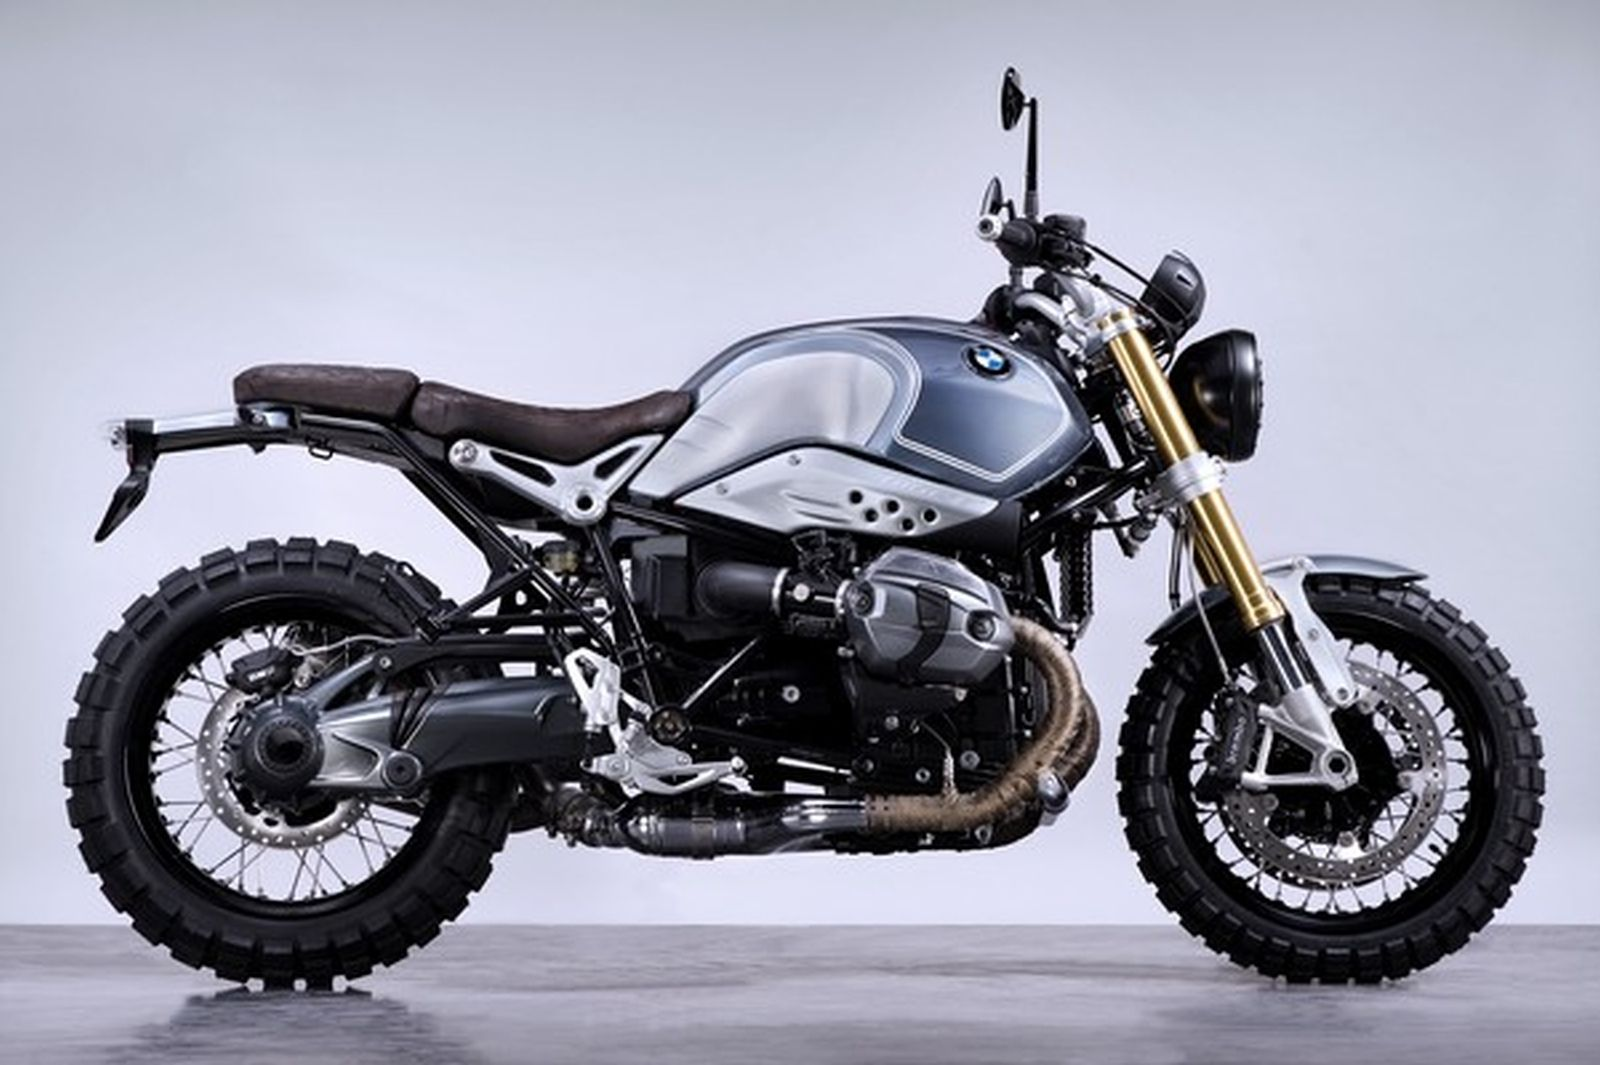 Bmw R Nine T Scrambler Motocicletas Bmw Motos Personalizadas